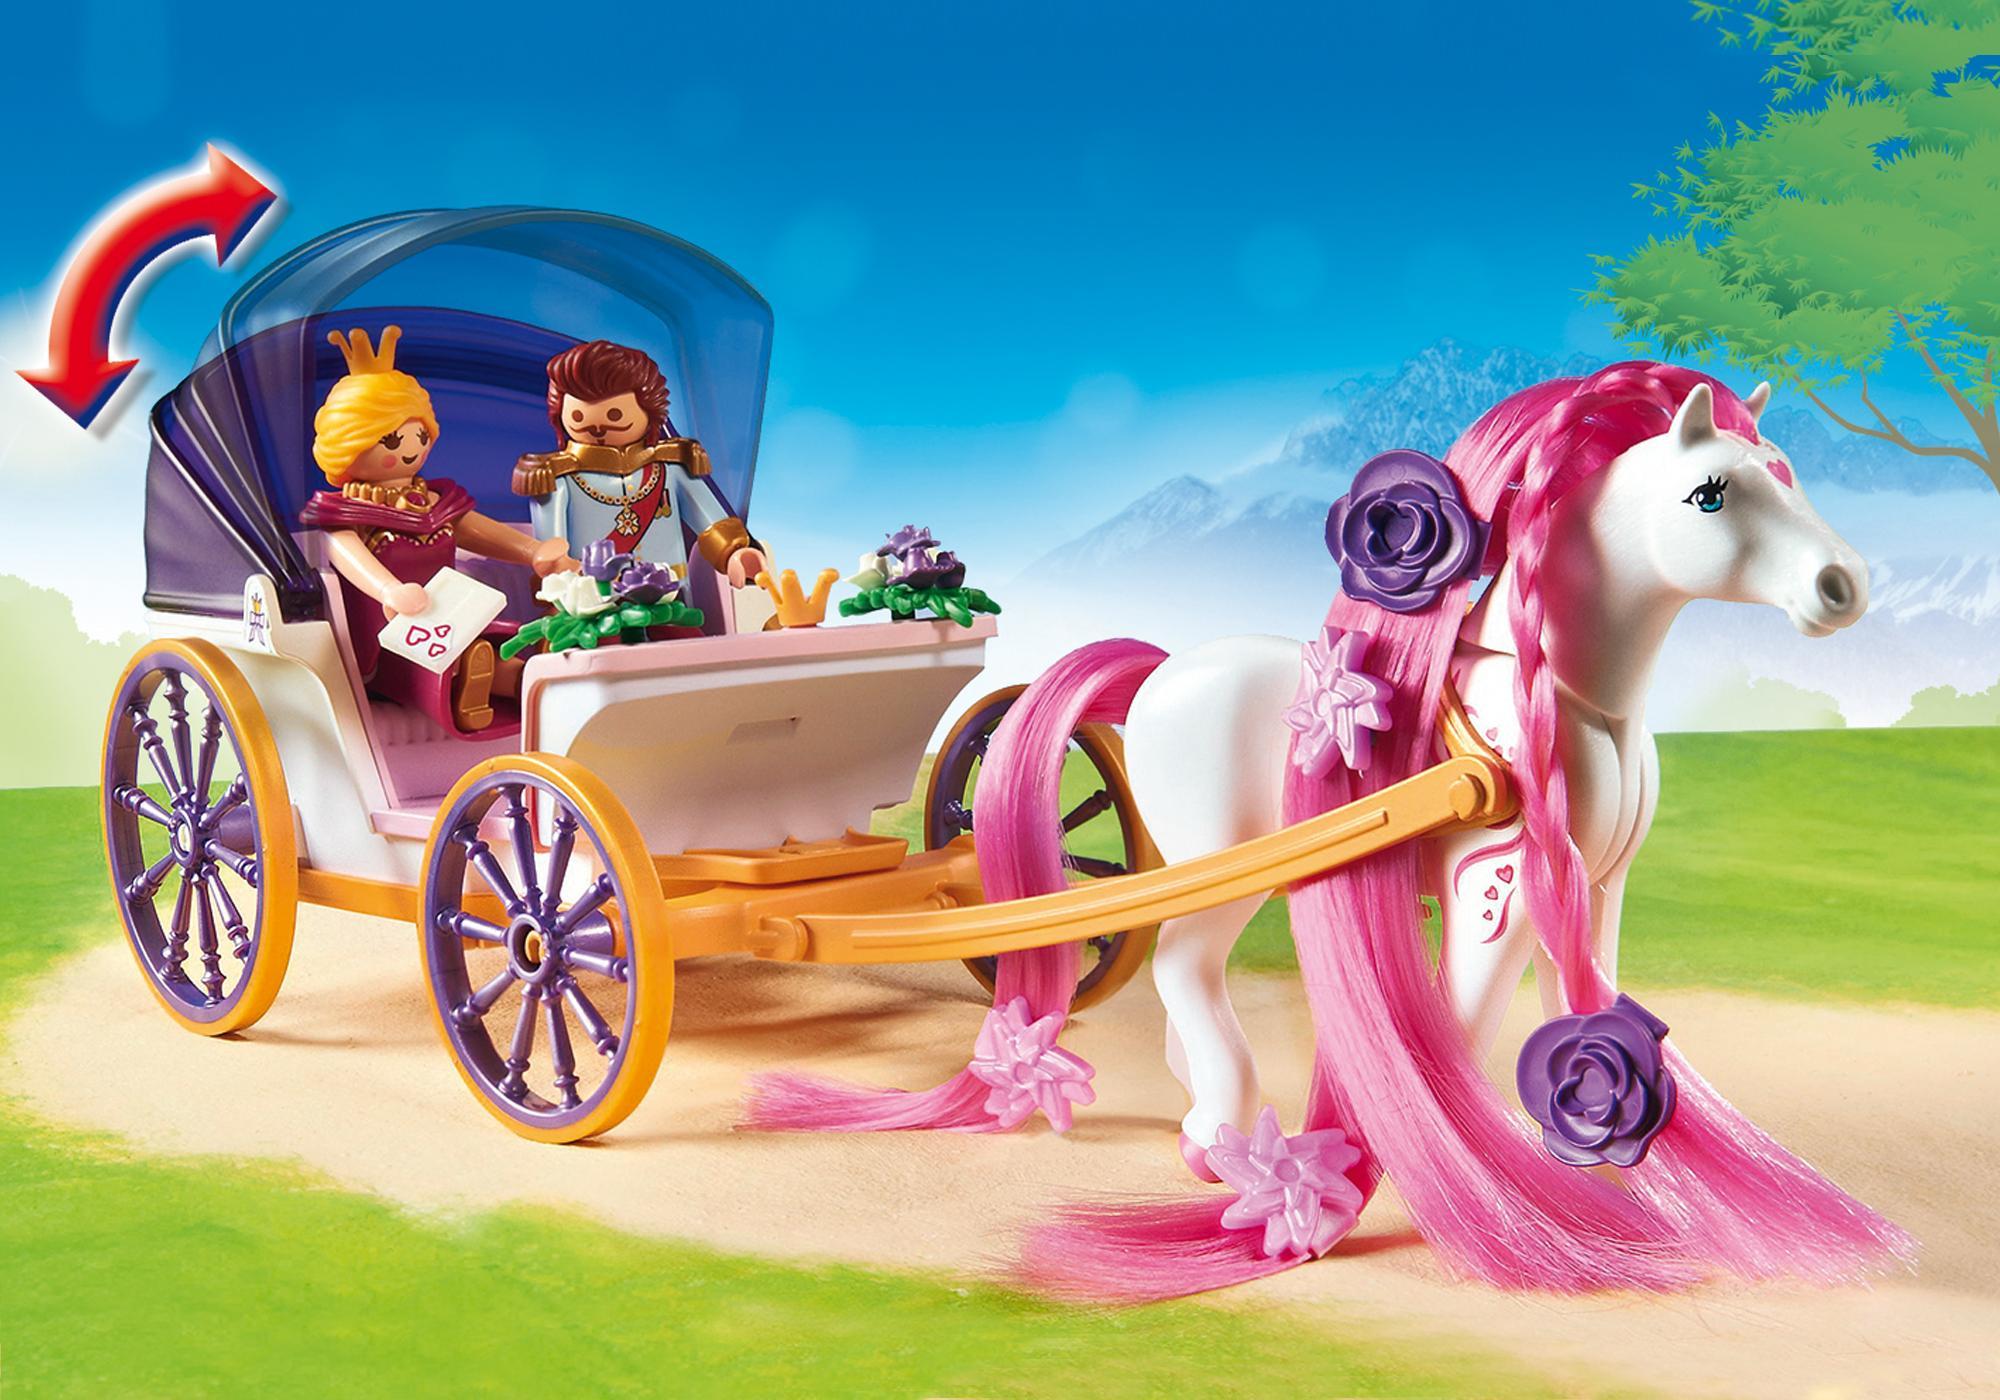 http://media.playmobil.com/i/playmobil/6856_product_extra2